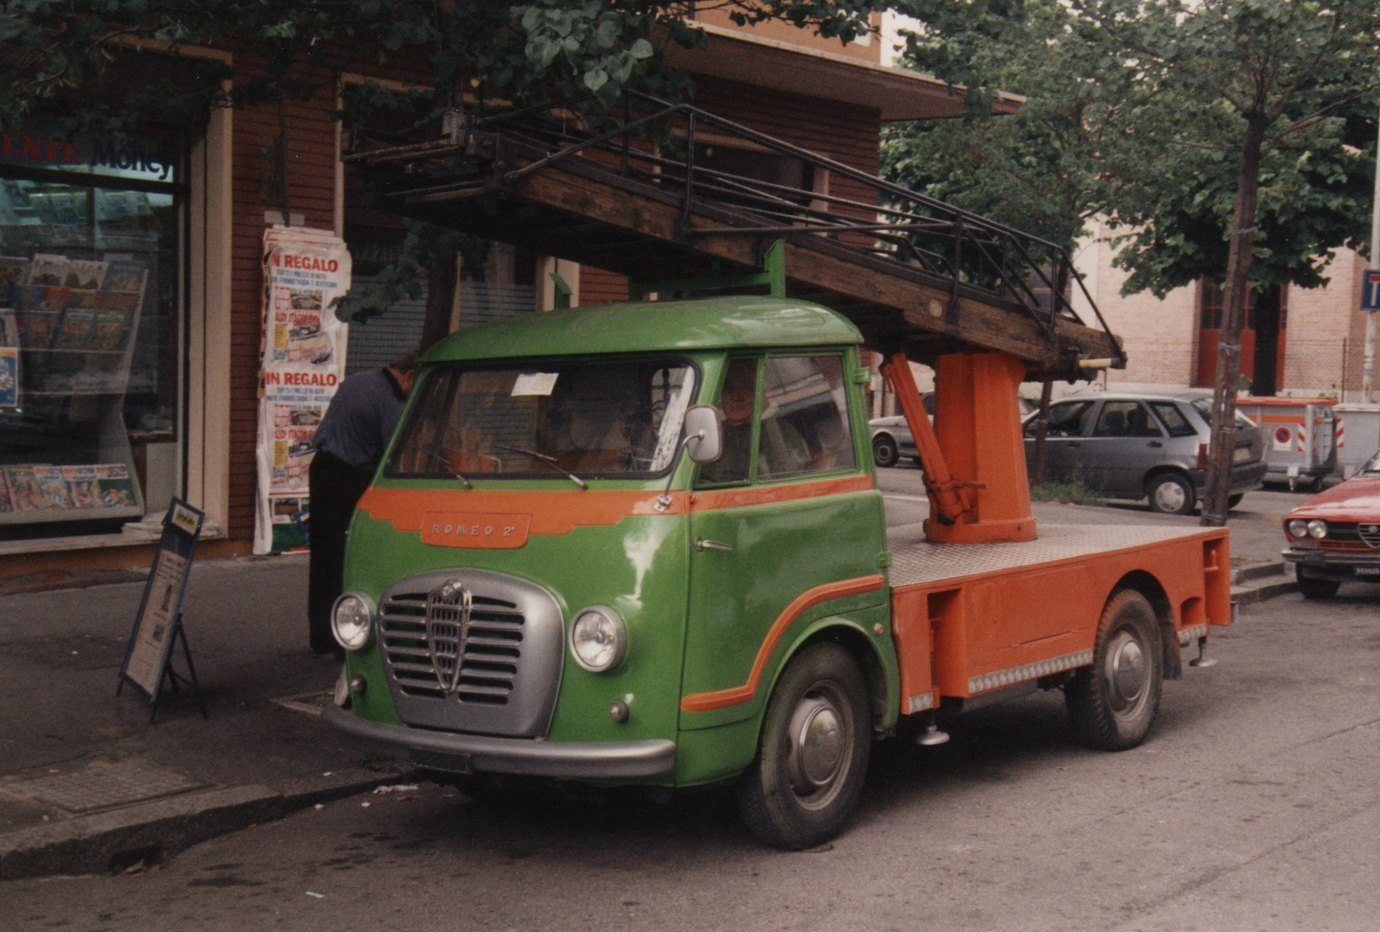 Alfa Romeo - Tractor